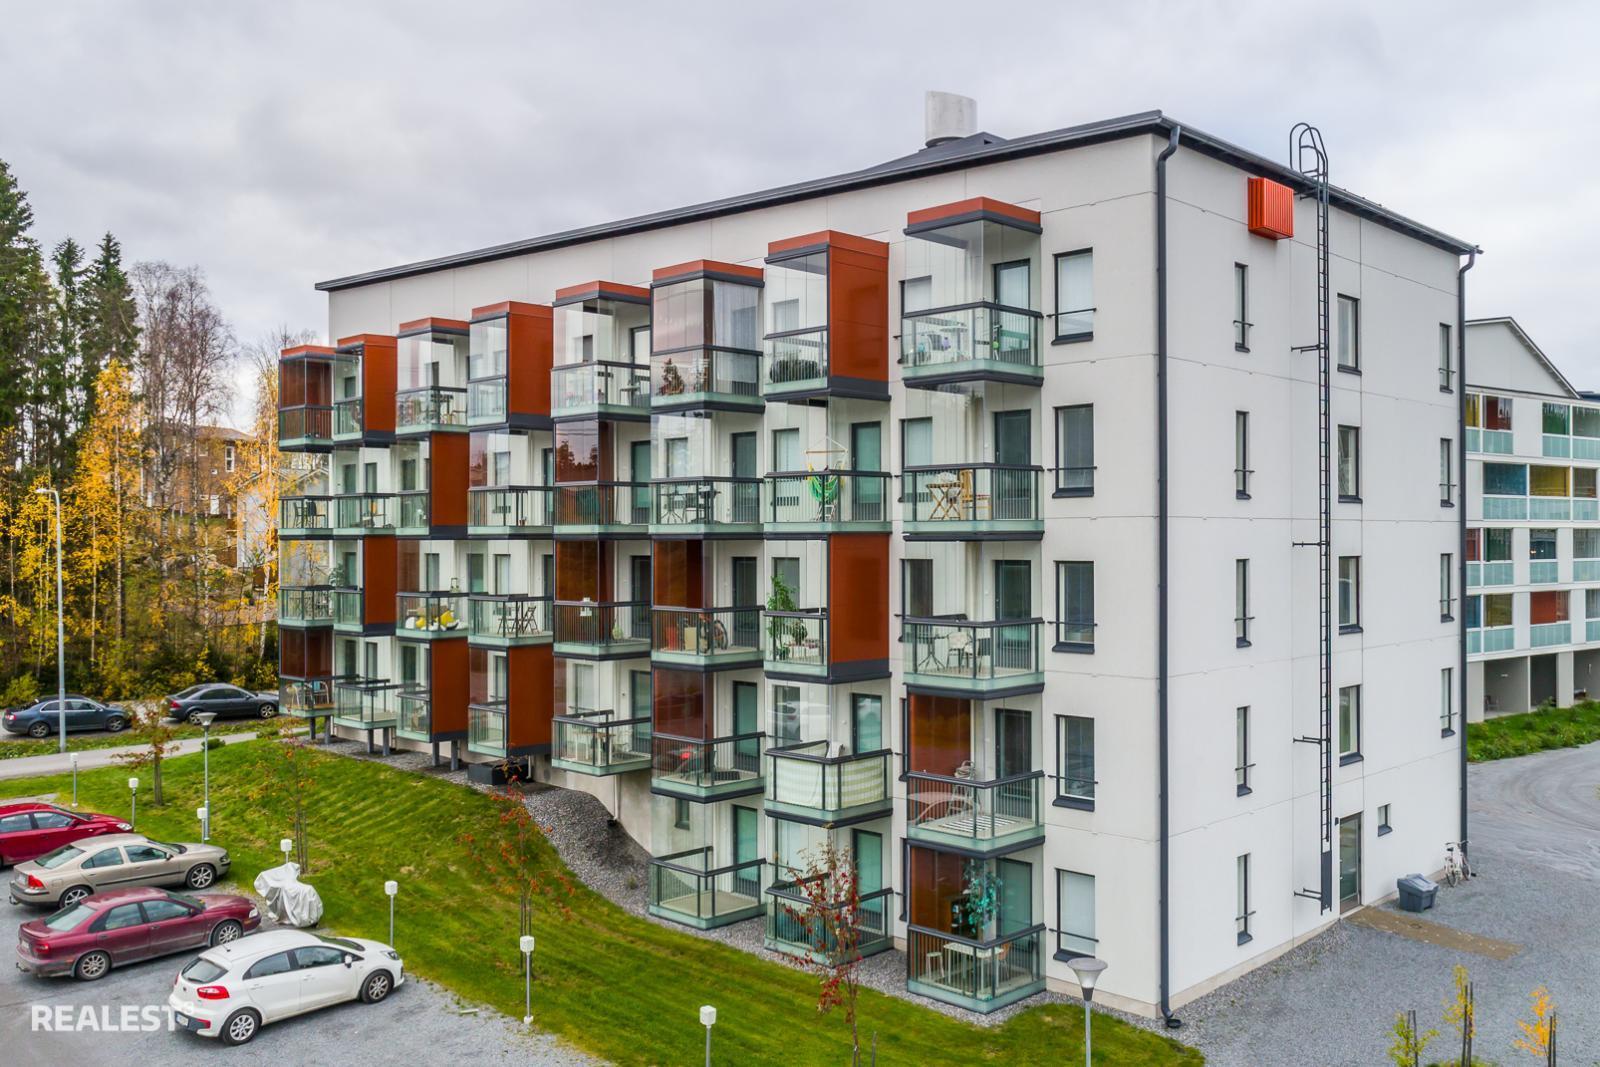 Juvankatu 85, 33710 Tampere, Annala